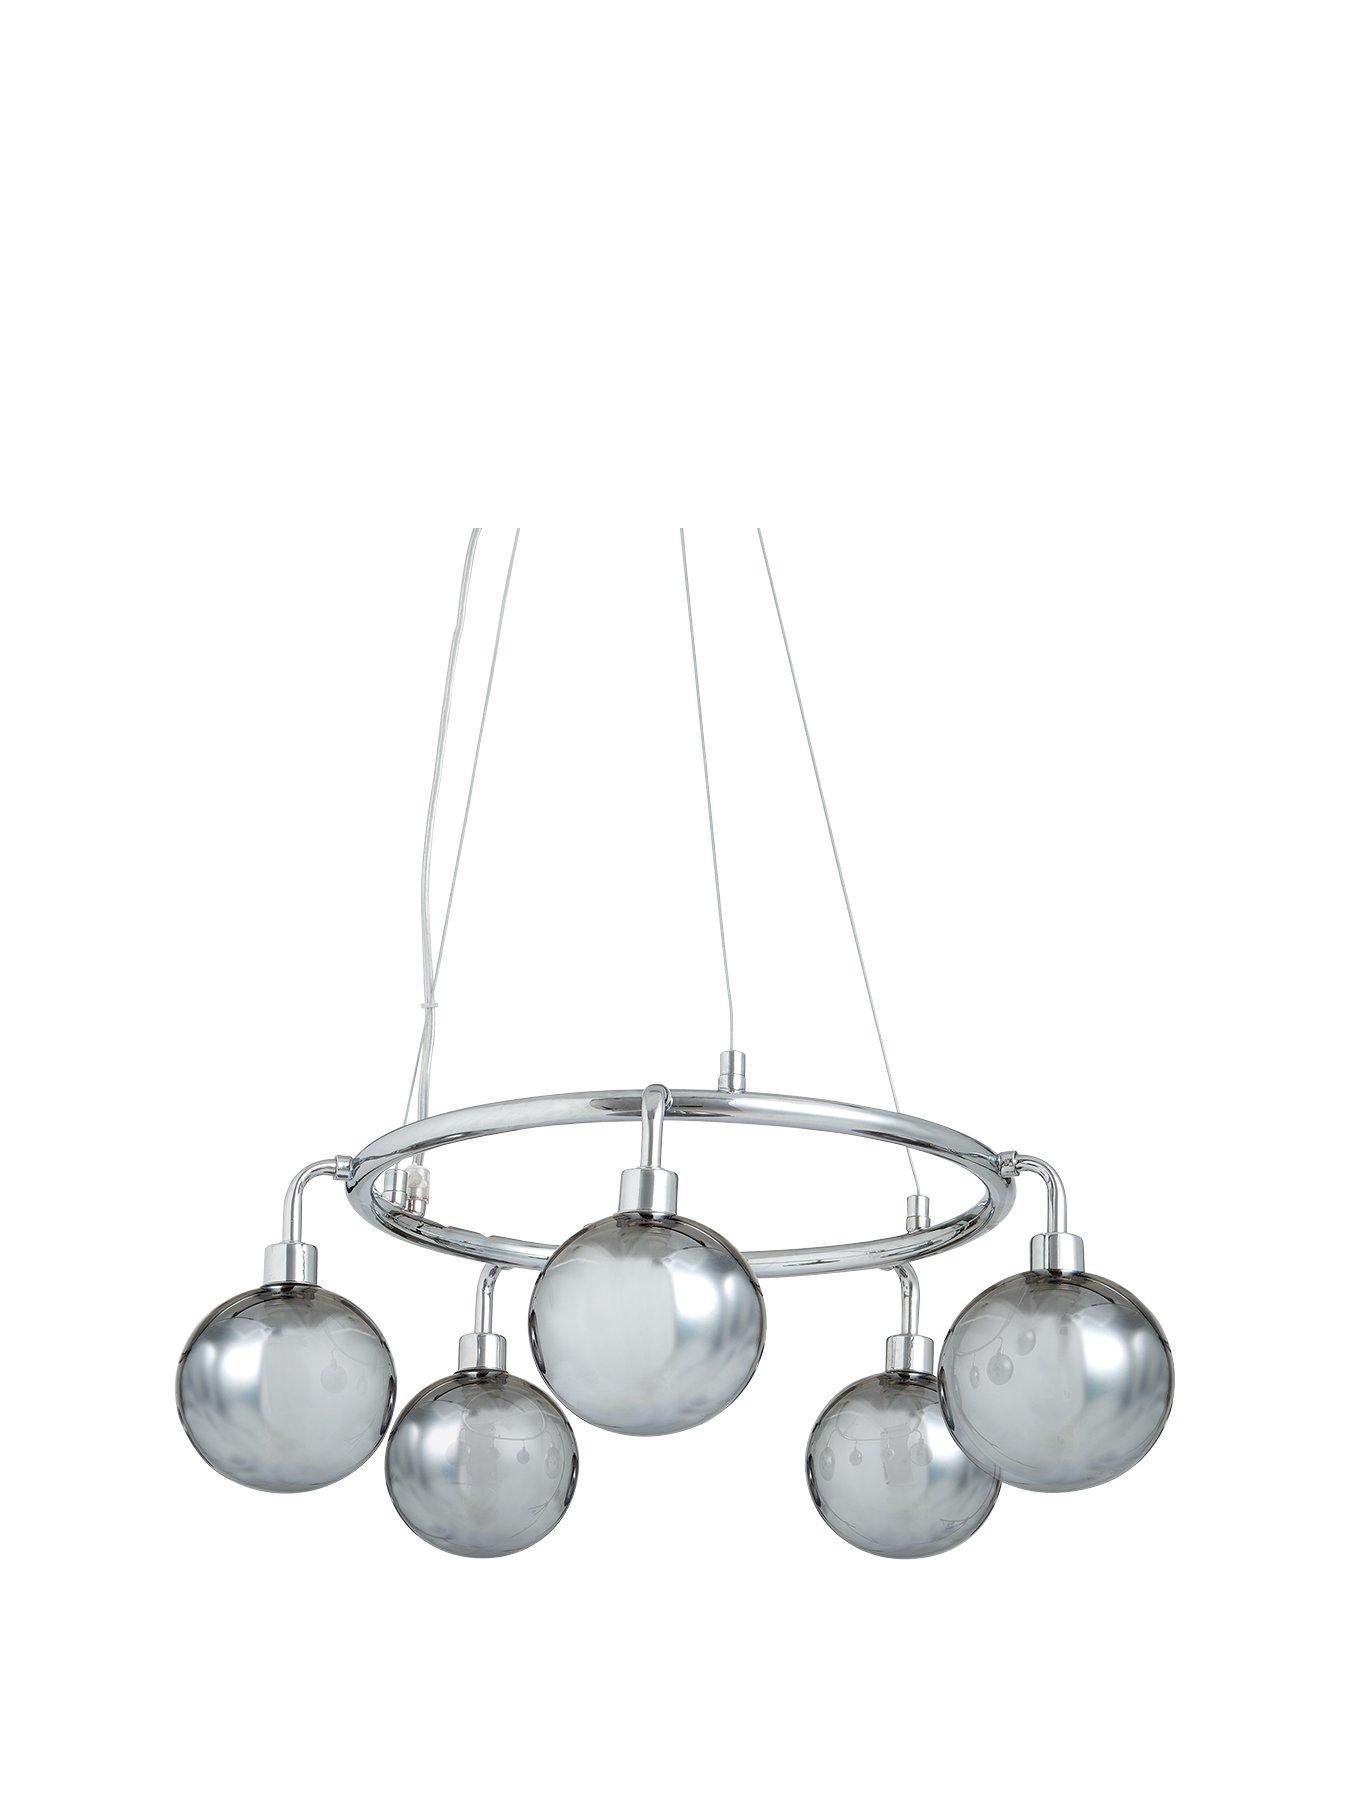 Home Spotlights Lighting. 5W Bedroom Led Crystal Ceiling Lamps For ...